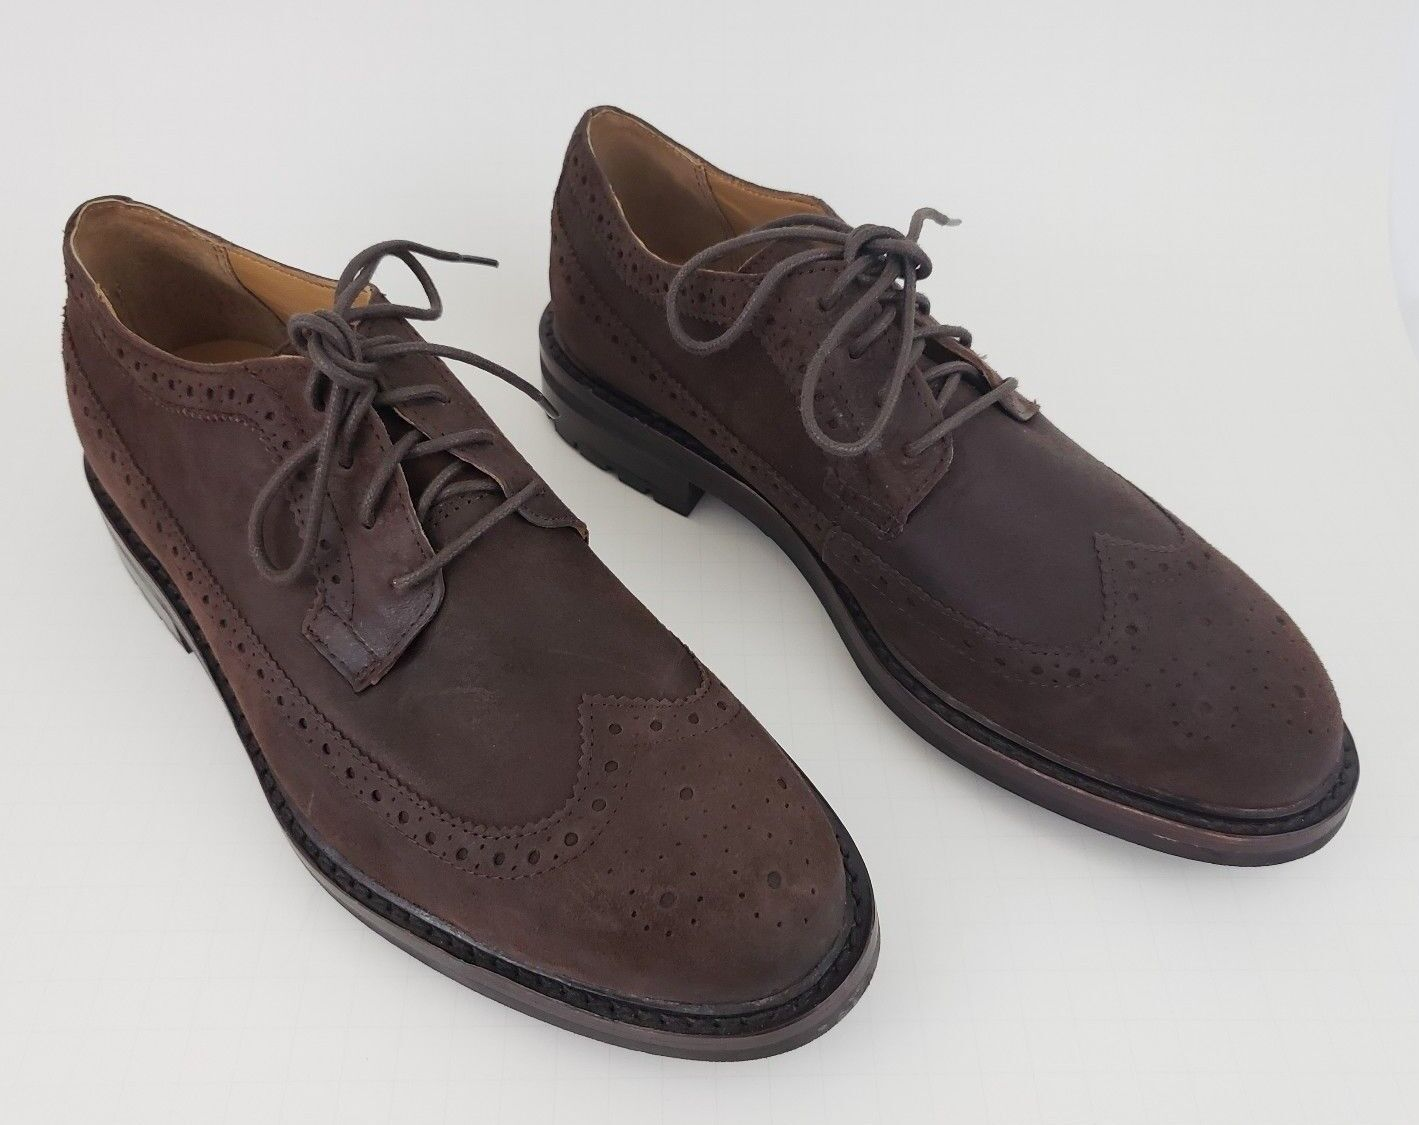 Polo Ralph Lauren Brogue Wingtip Oxfords Dress shoes Men's 8.5   9 Brown Suede